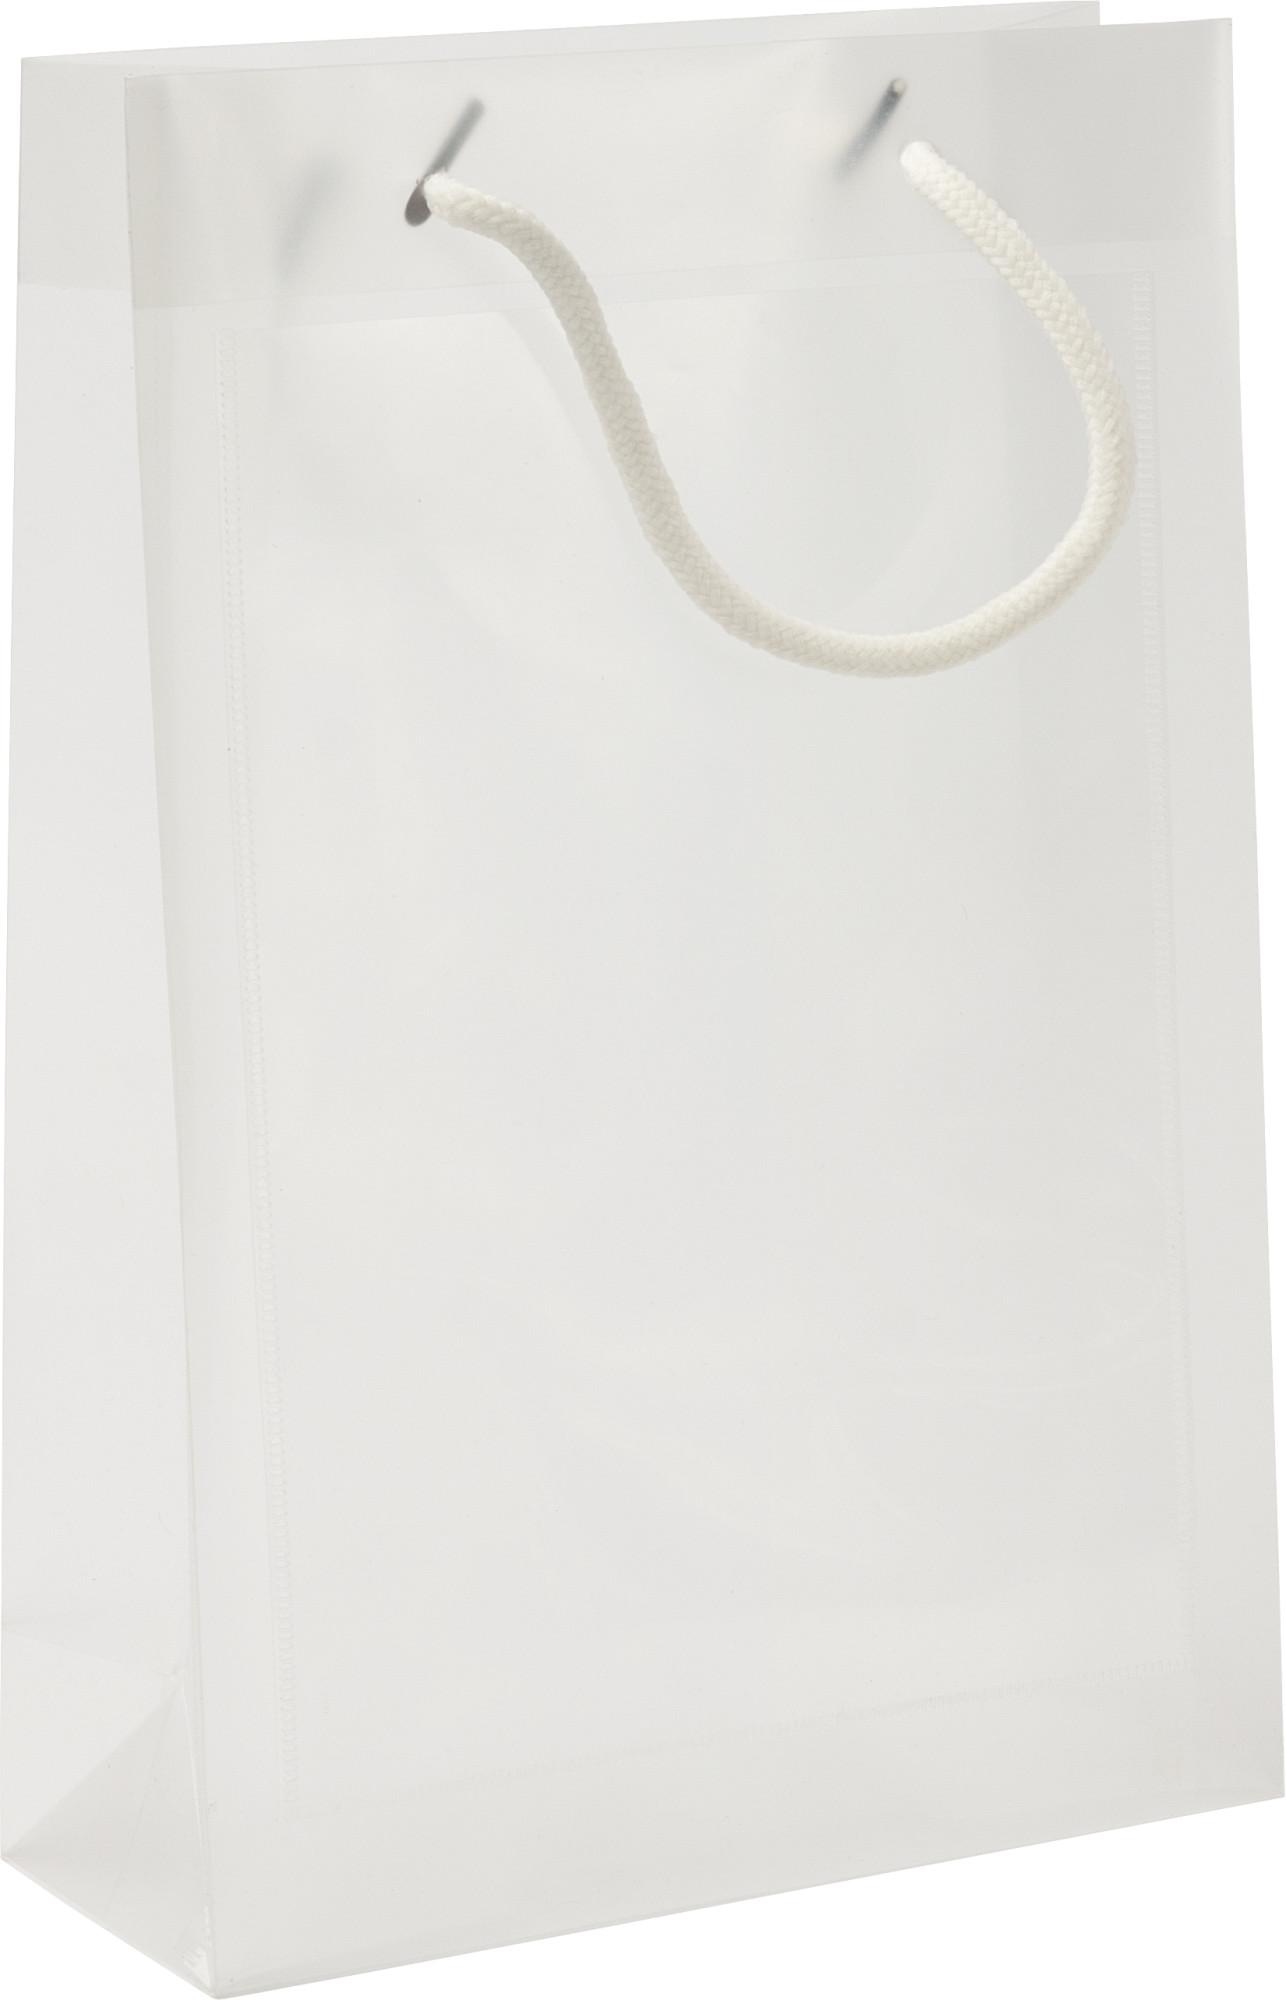 Promotional A5 size polypropylene bag